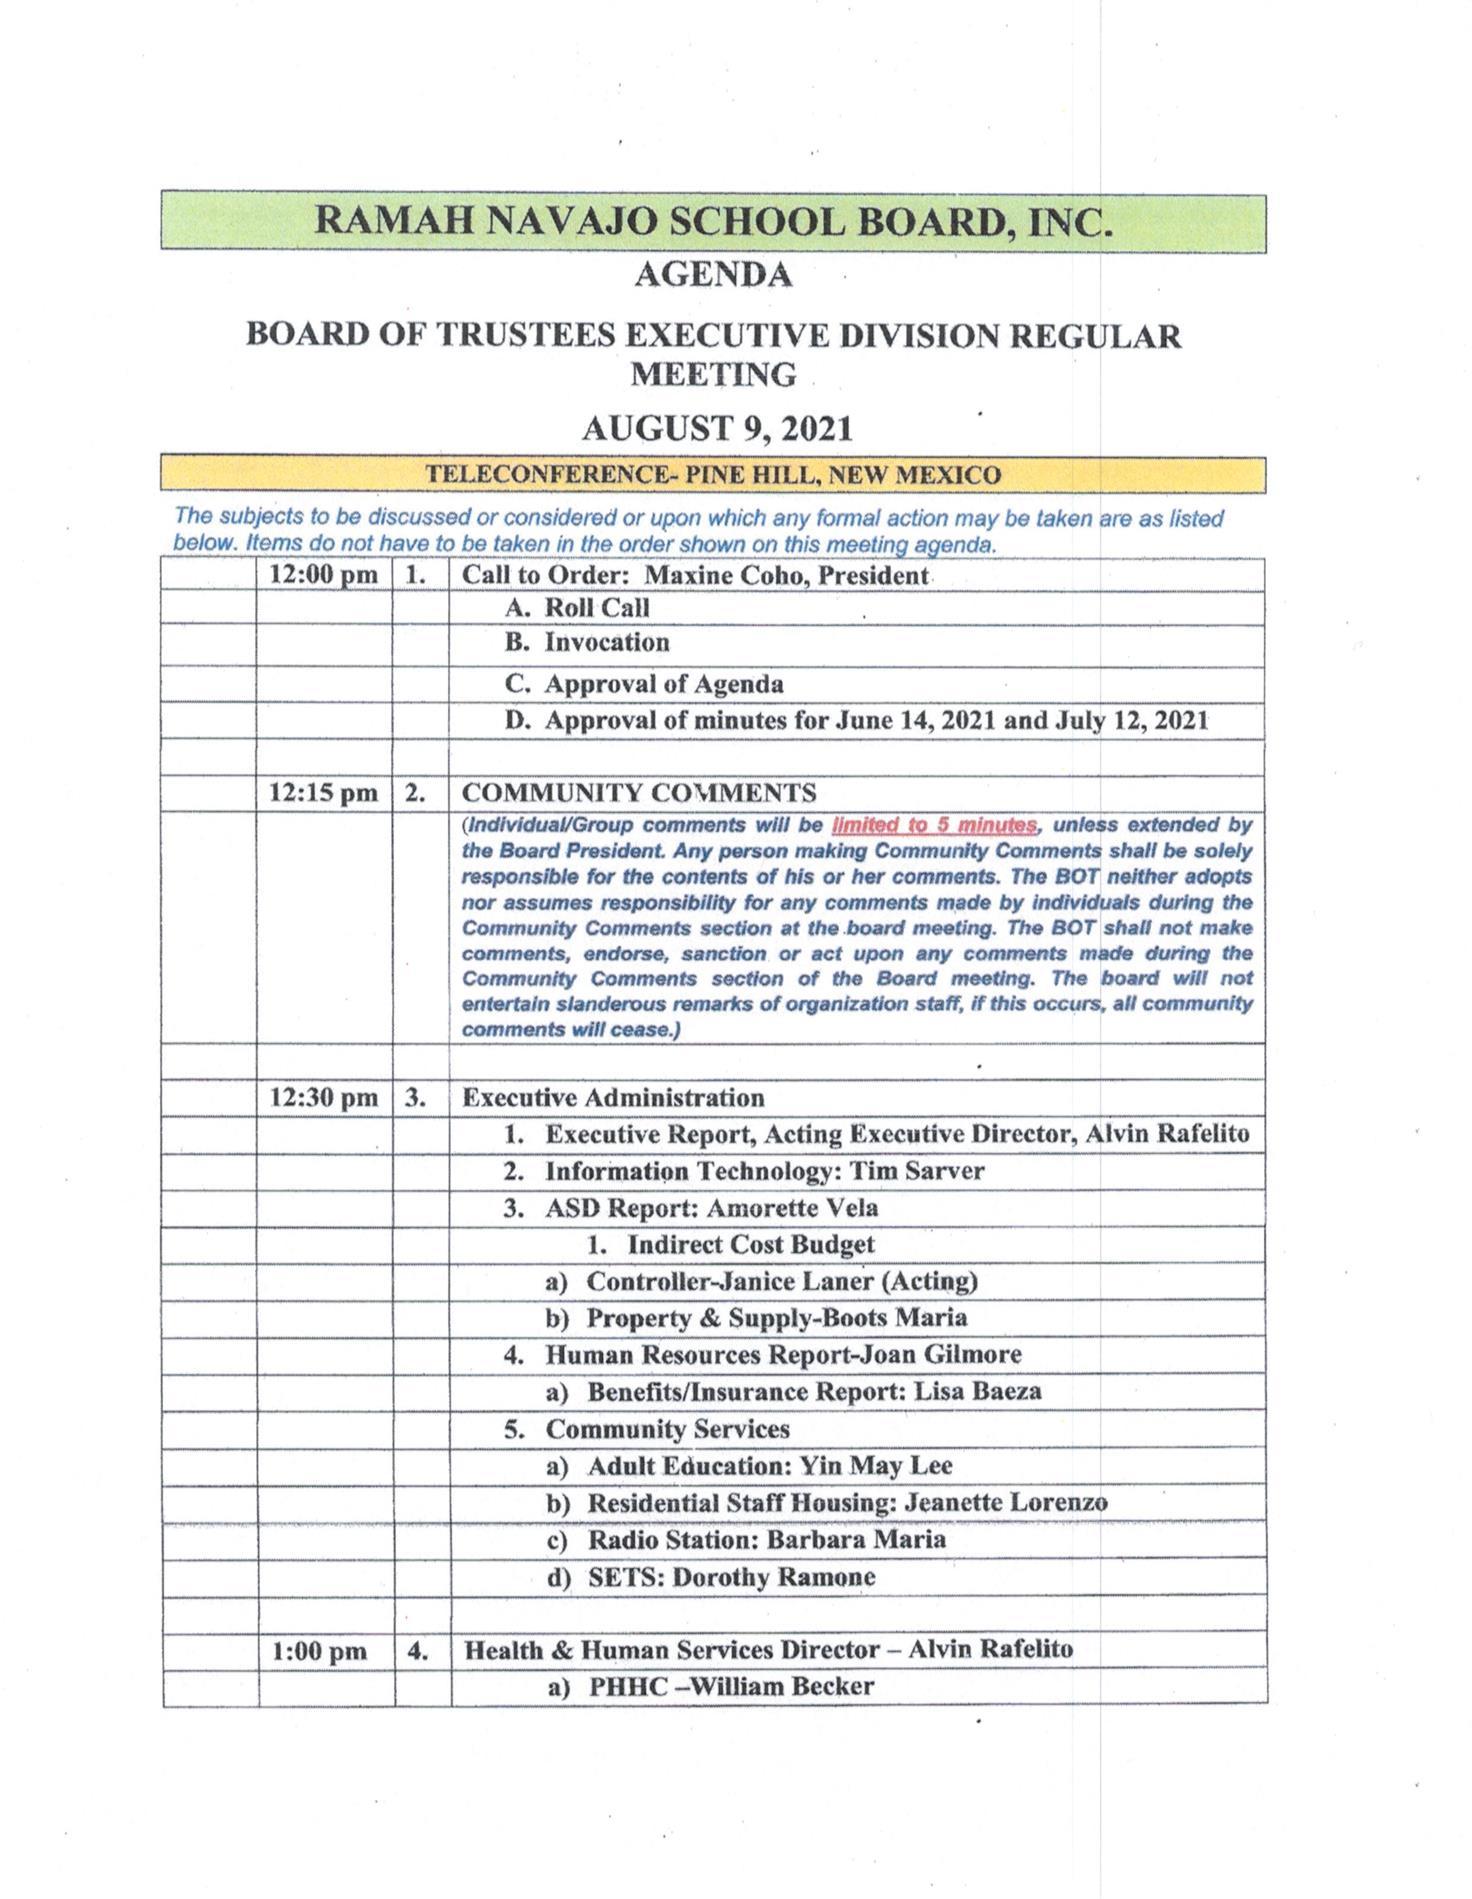 Ramah Navajo School Board Meeting Agenda